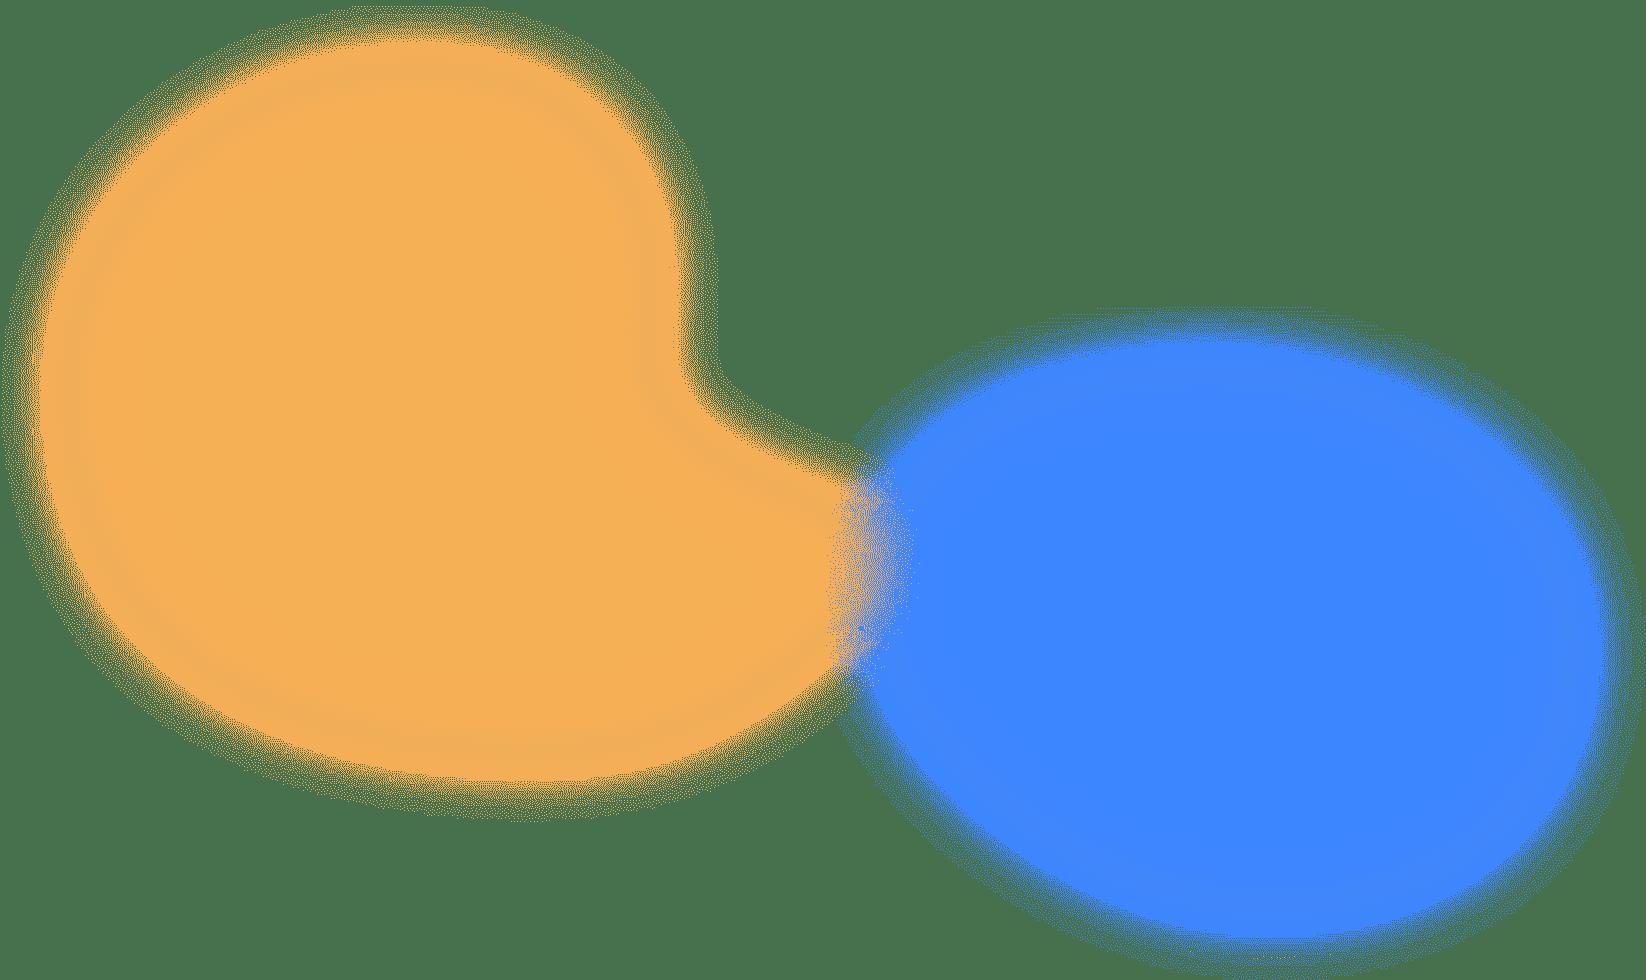 bg-yellow-blue